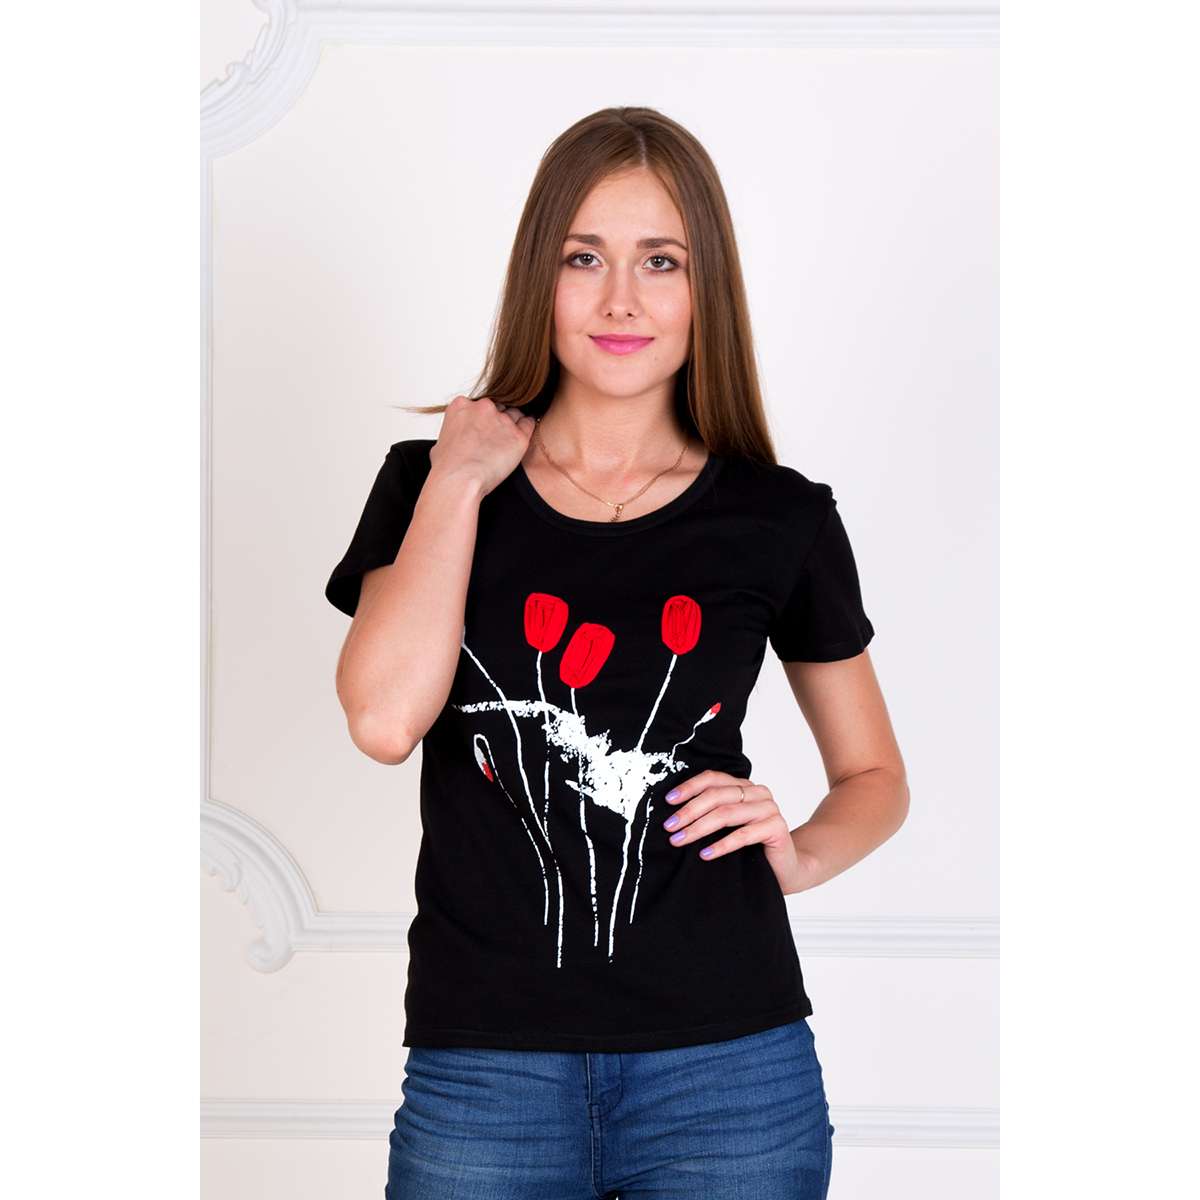 Женская футболка Маки, размер 56Блузки, майки, кофты<br>Обхват груди:112 см<br>Обхват талии:92 см<br>Обхват бедер:120 см<br>Рост:167 см<br><br>Тип: Жен. футболка<br>Размер: 56<br>Материал: Кулирка